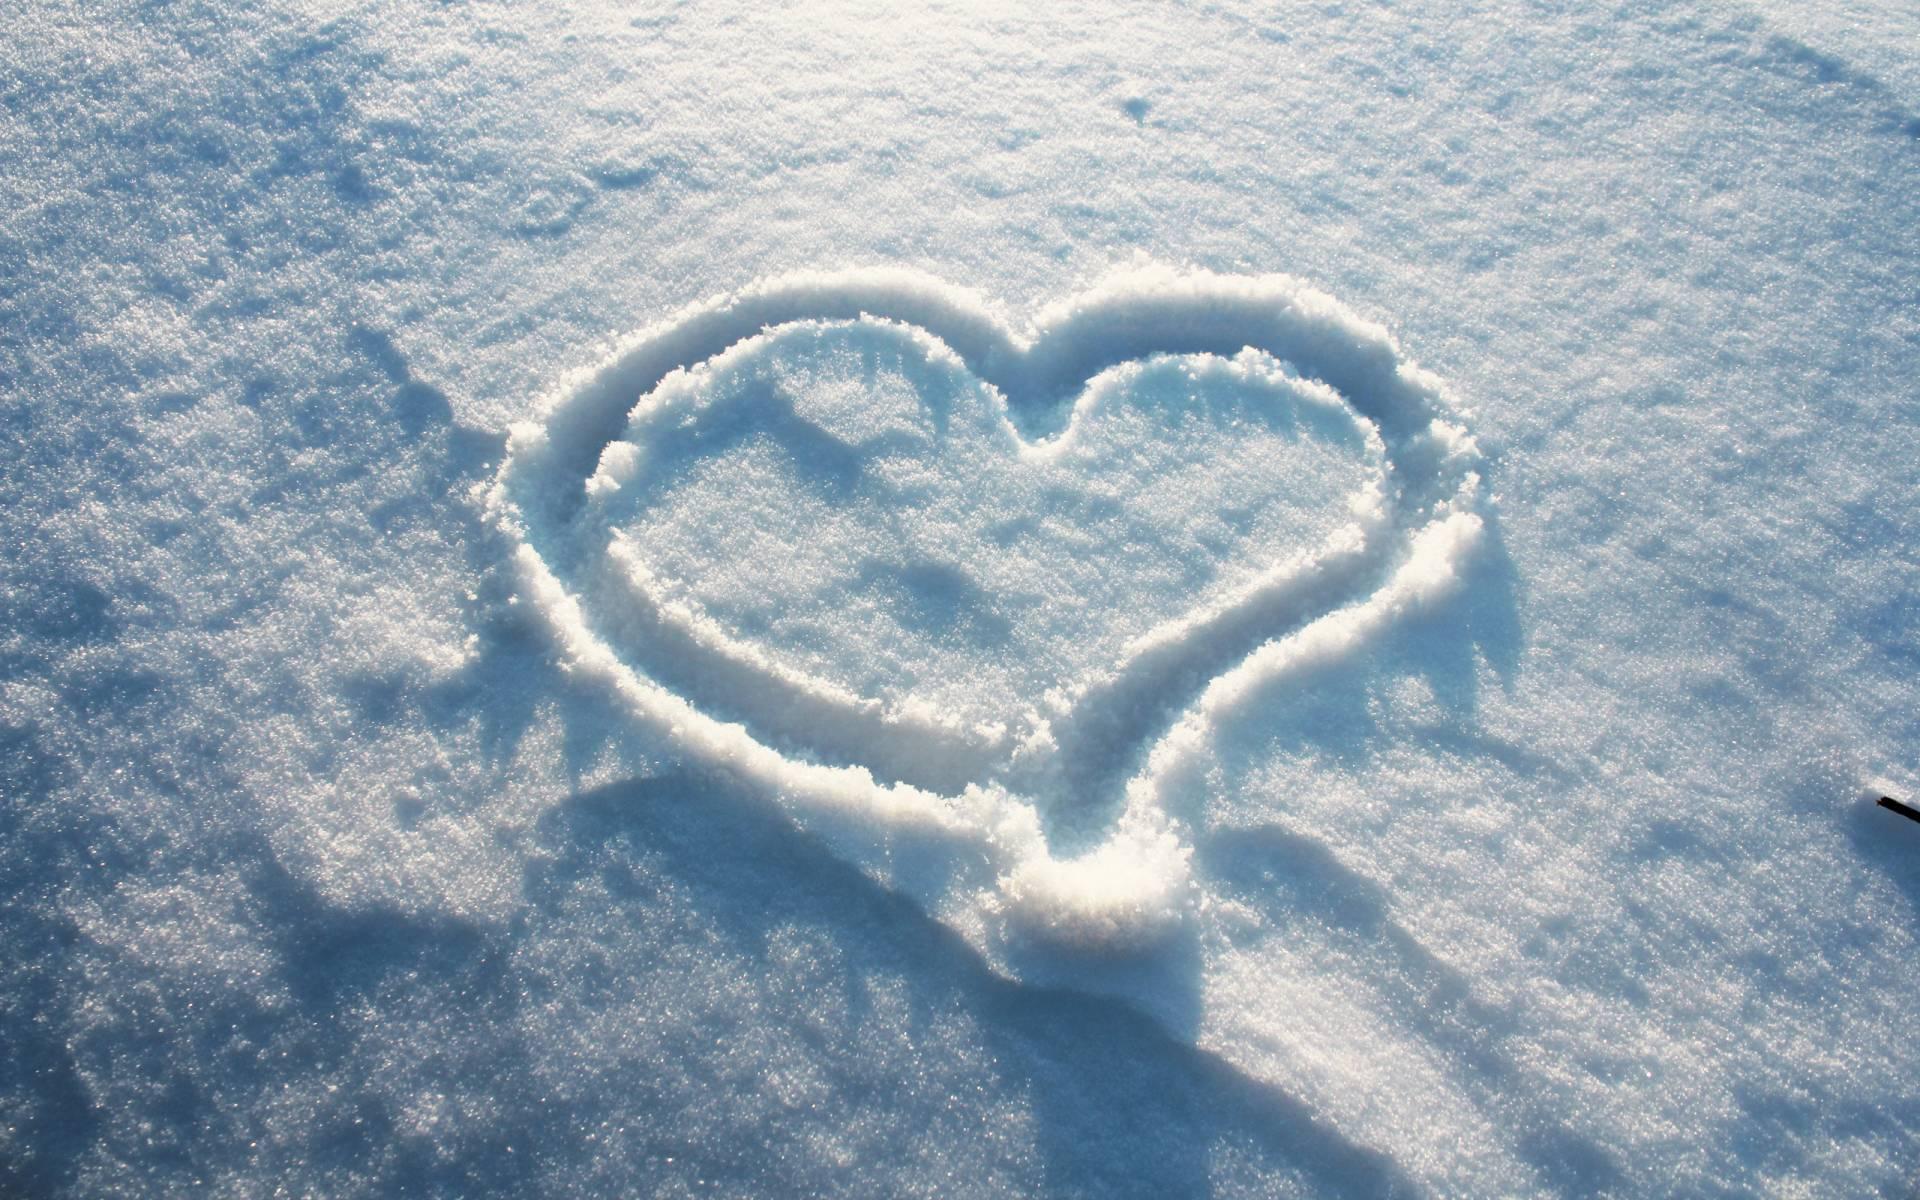 Winter Love Wallpapers HD Wallpaper of Love   hdwallpaper2013com 1920x1200